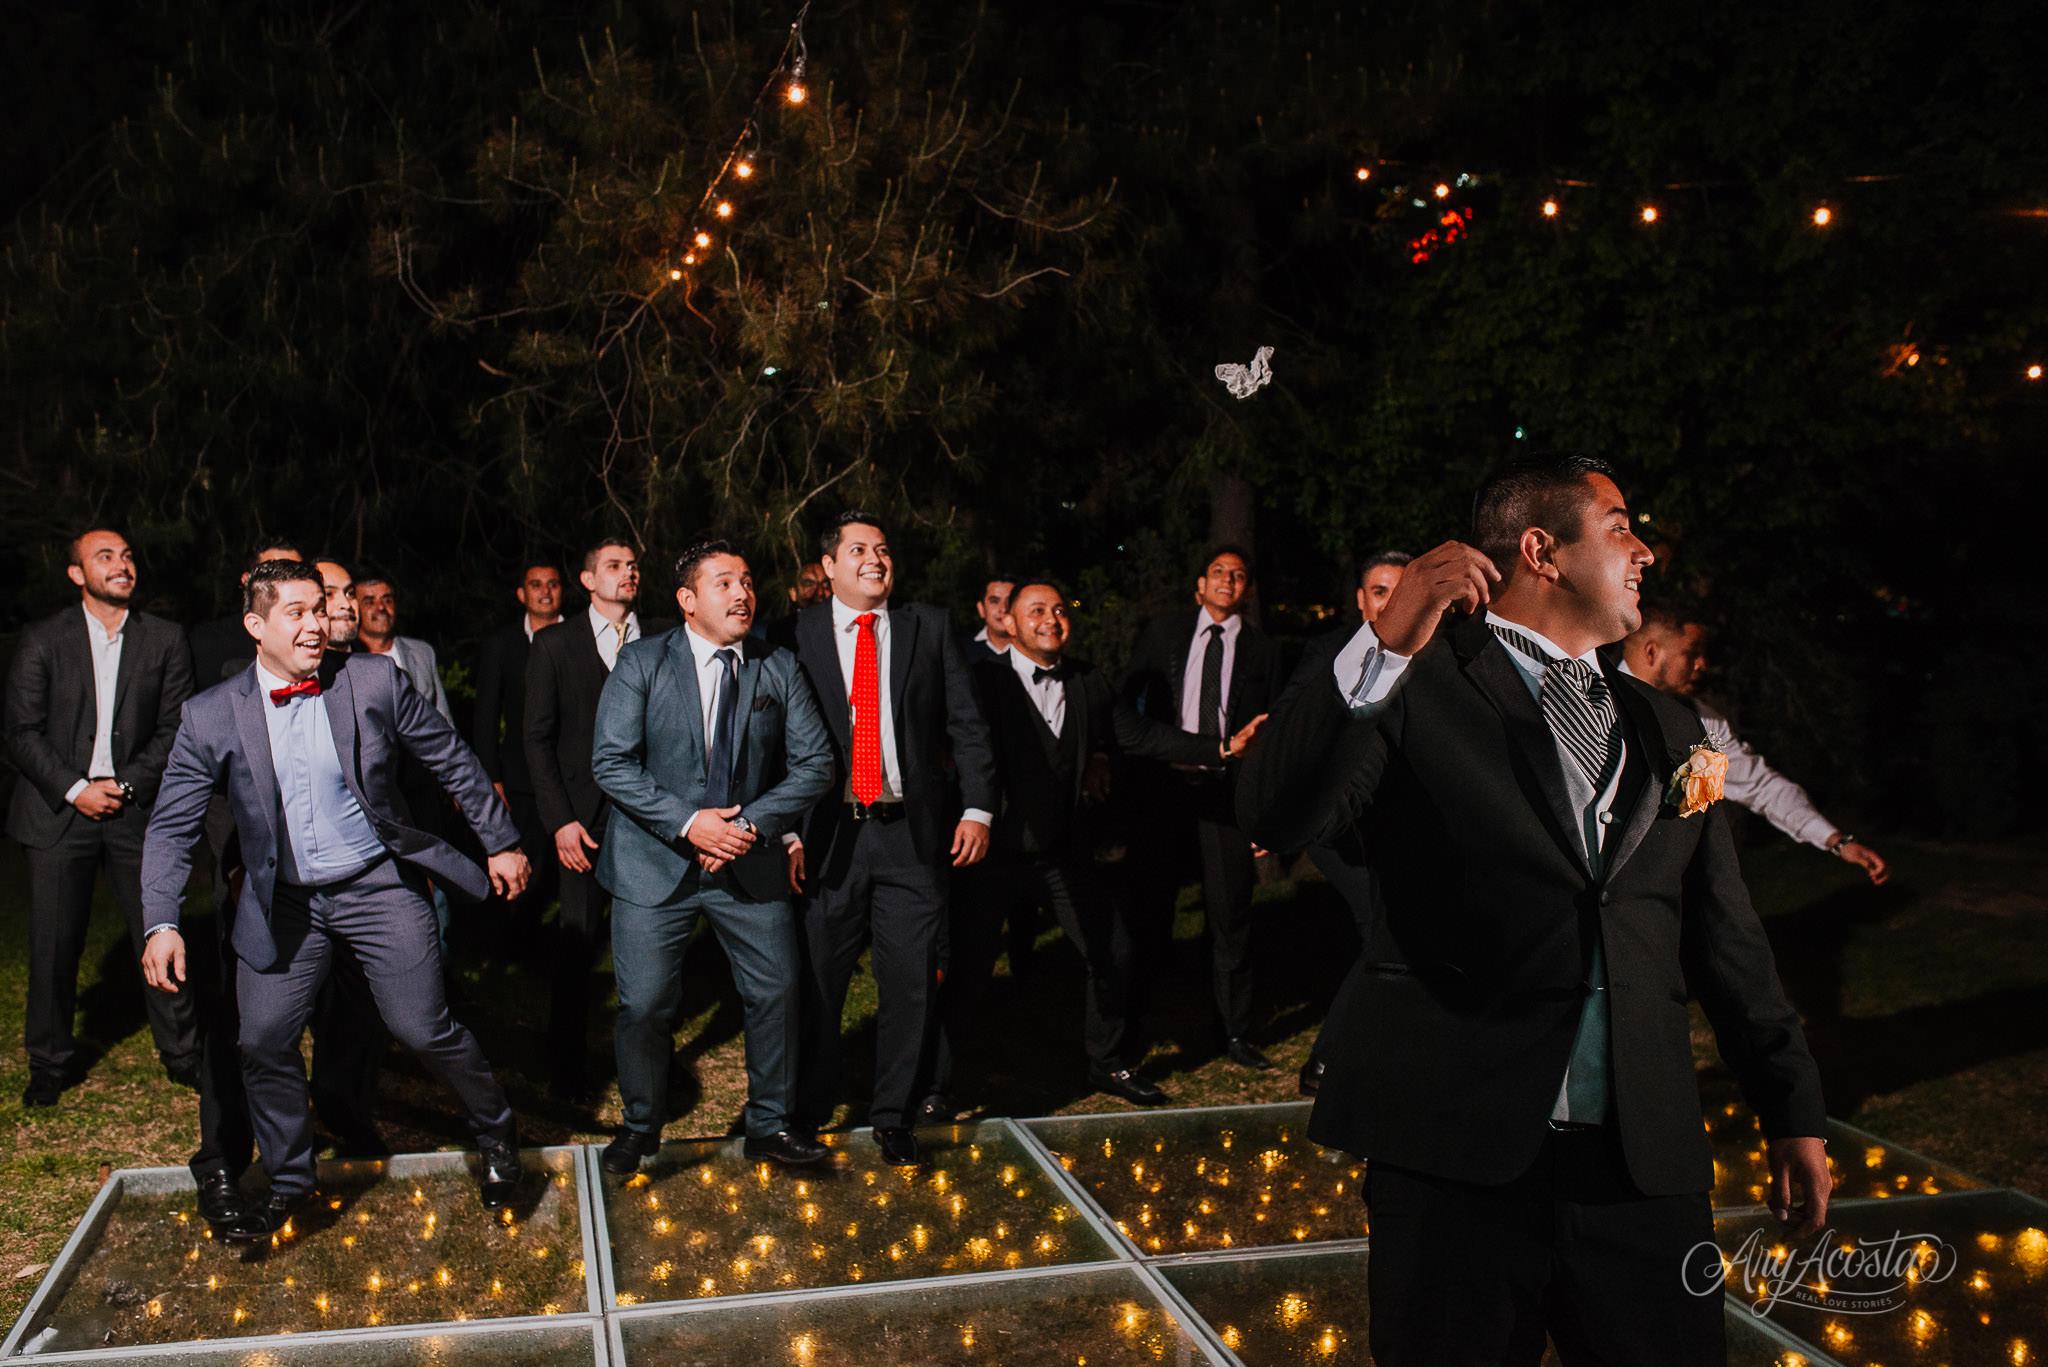 yazmin_ernesto_wedding-489.JPG